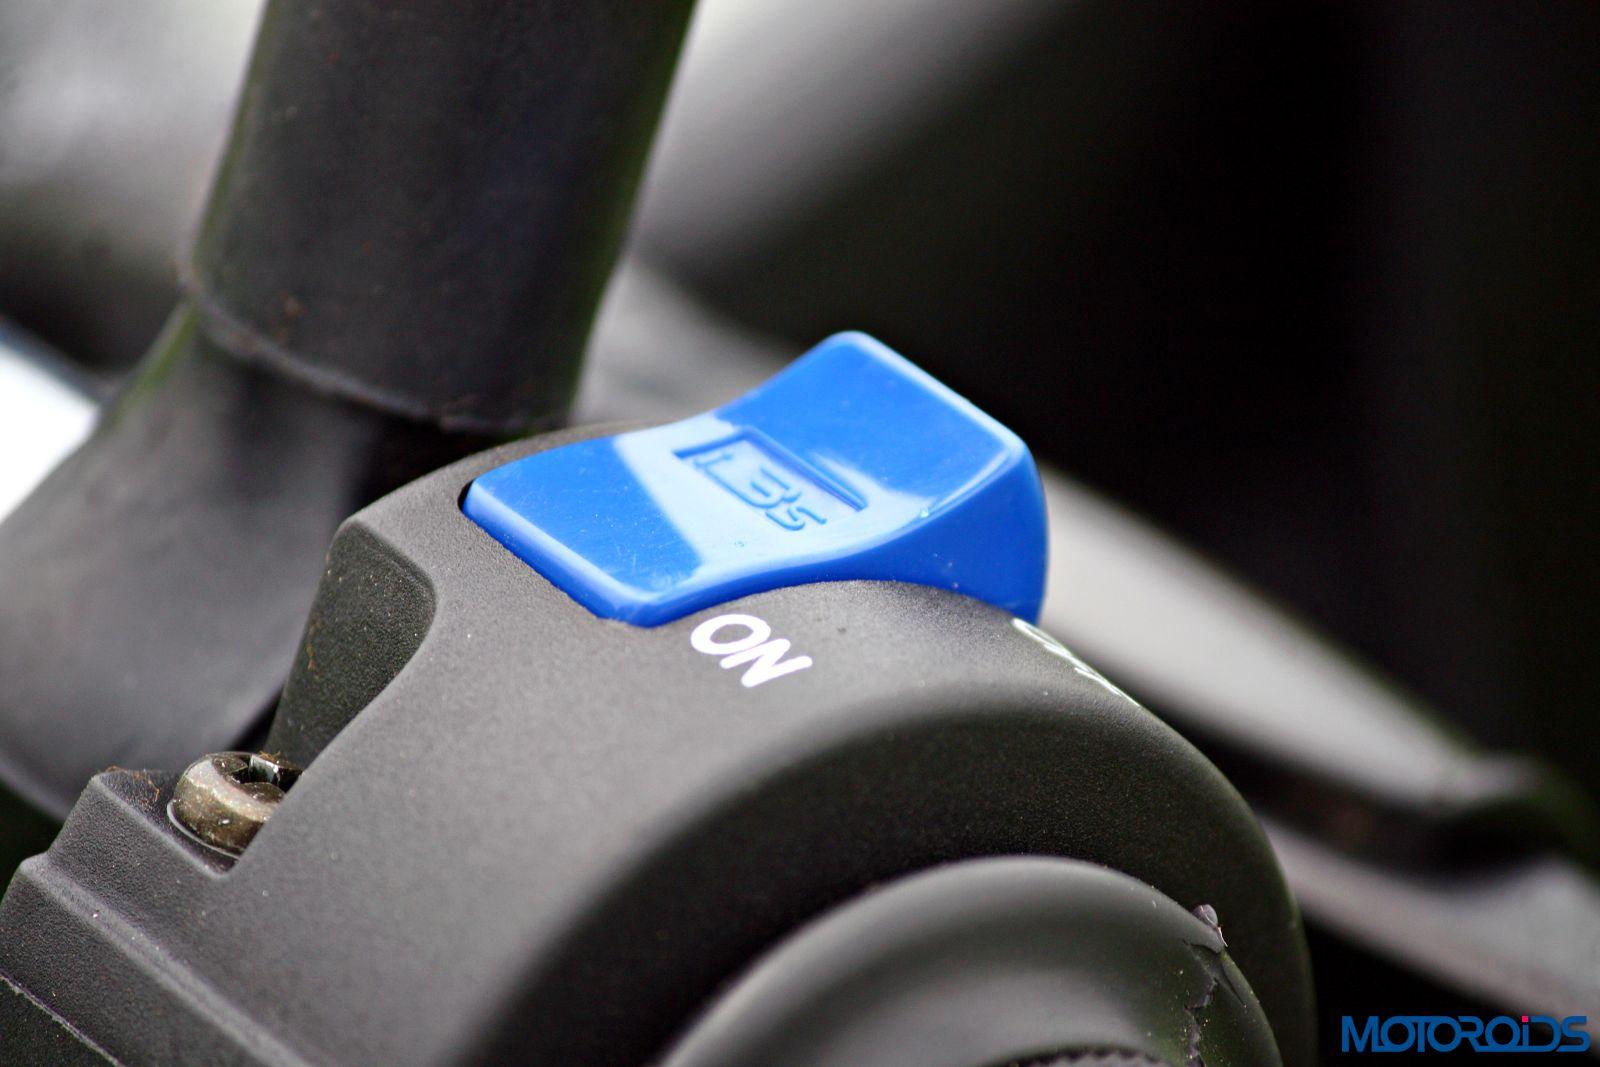 Hero MotoCorp Splendor 110 iSmart switchgear (2)